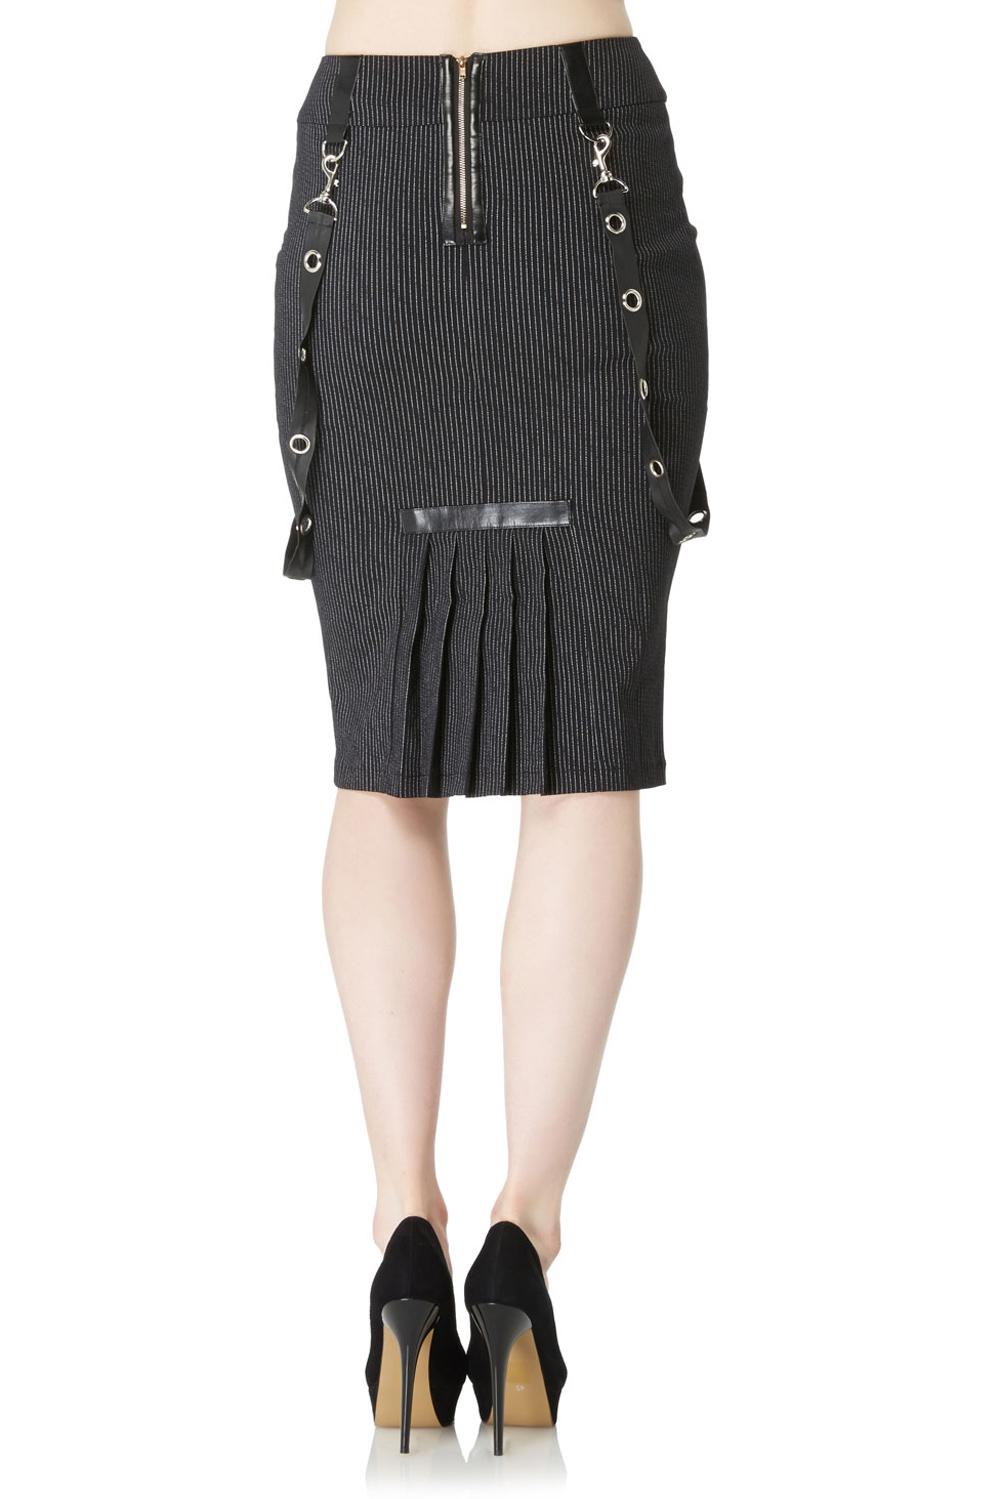 Grovel Pinstripe Pencil Skirt